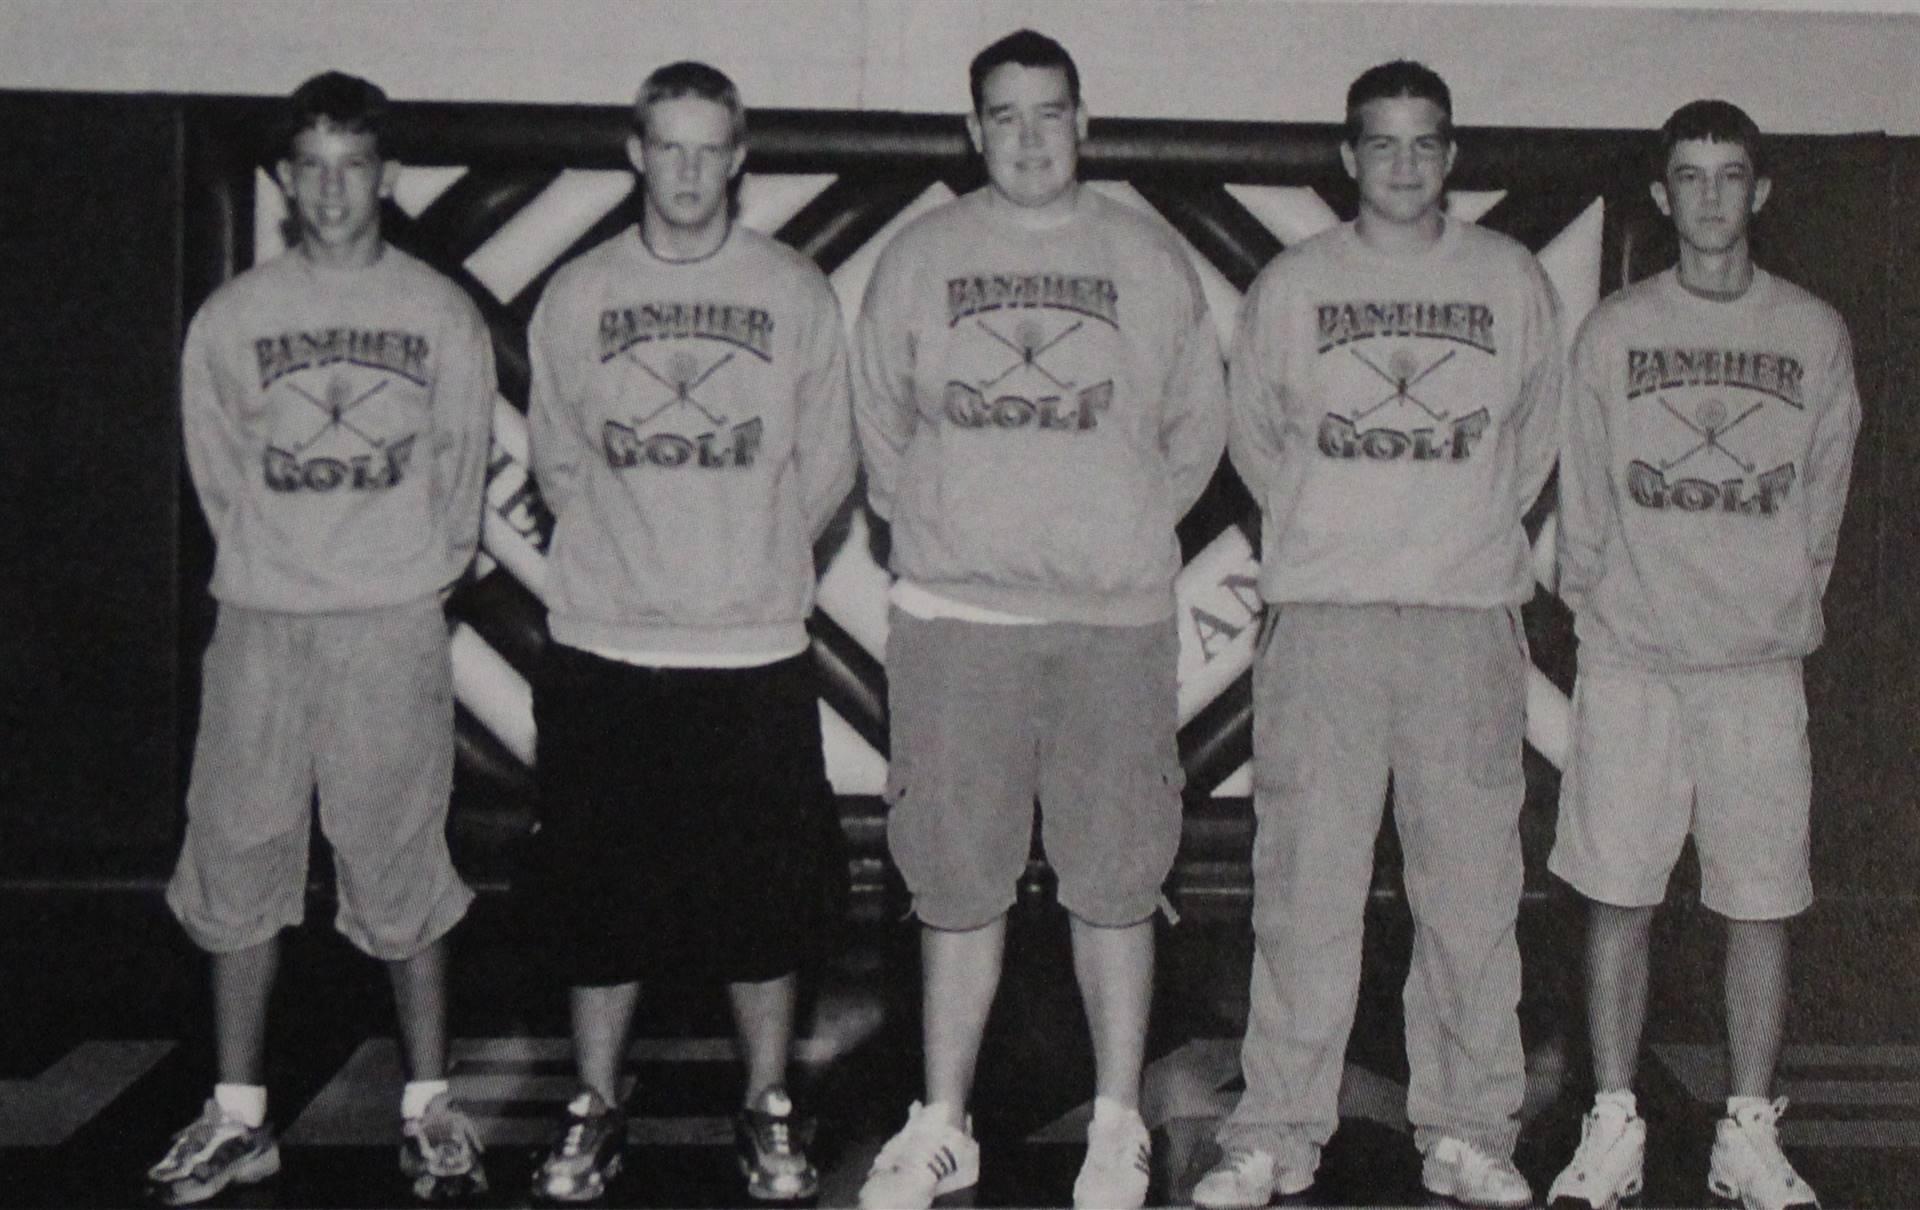 2001 Golf